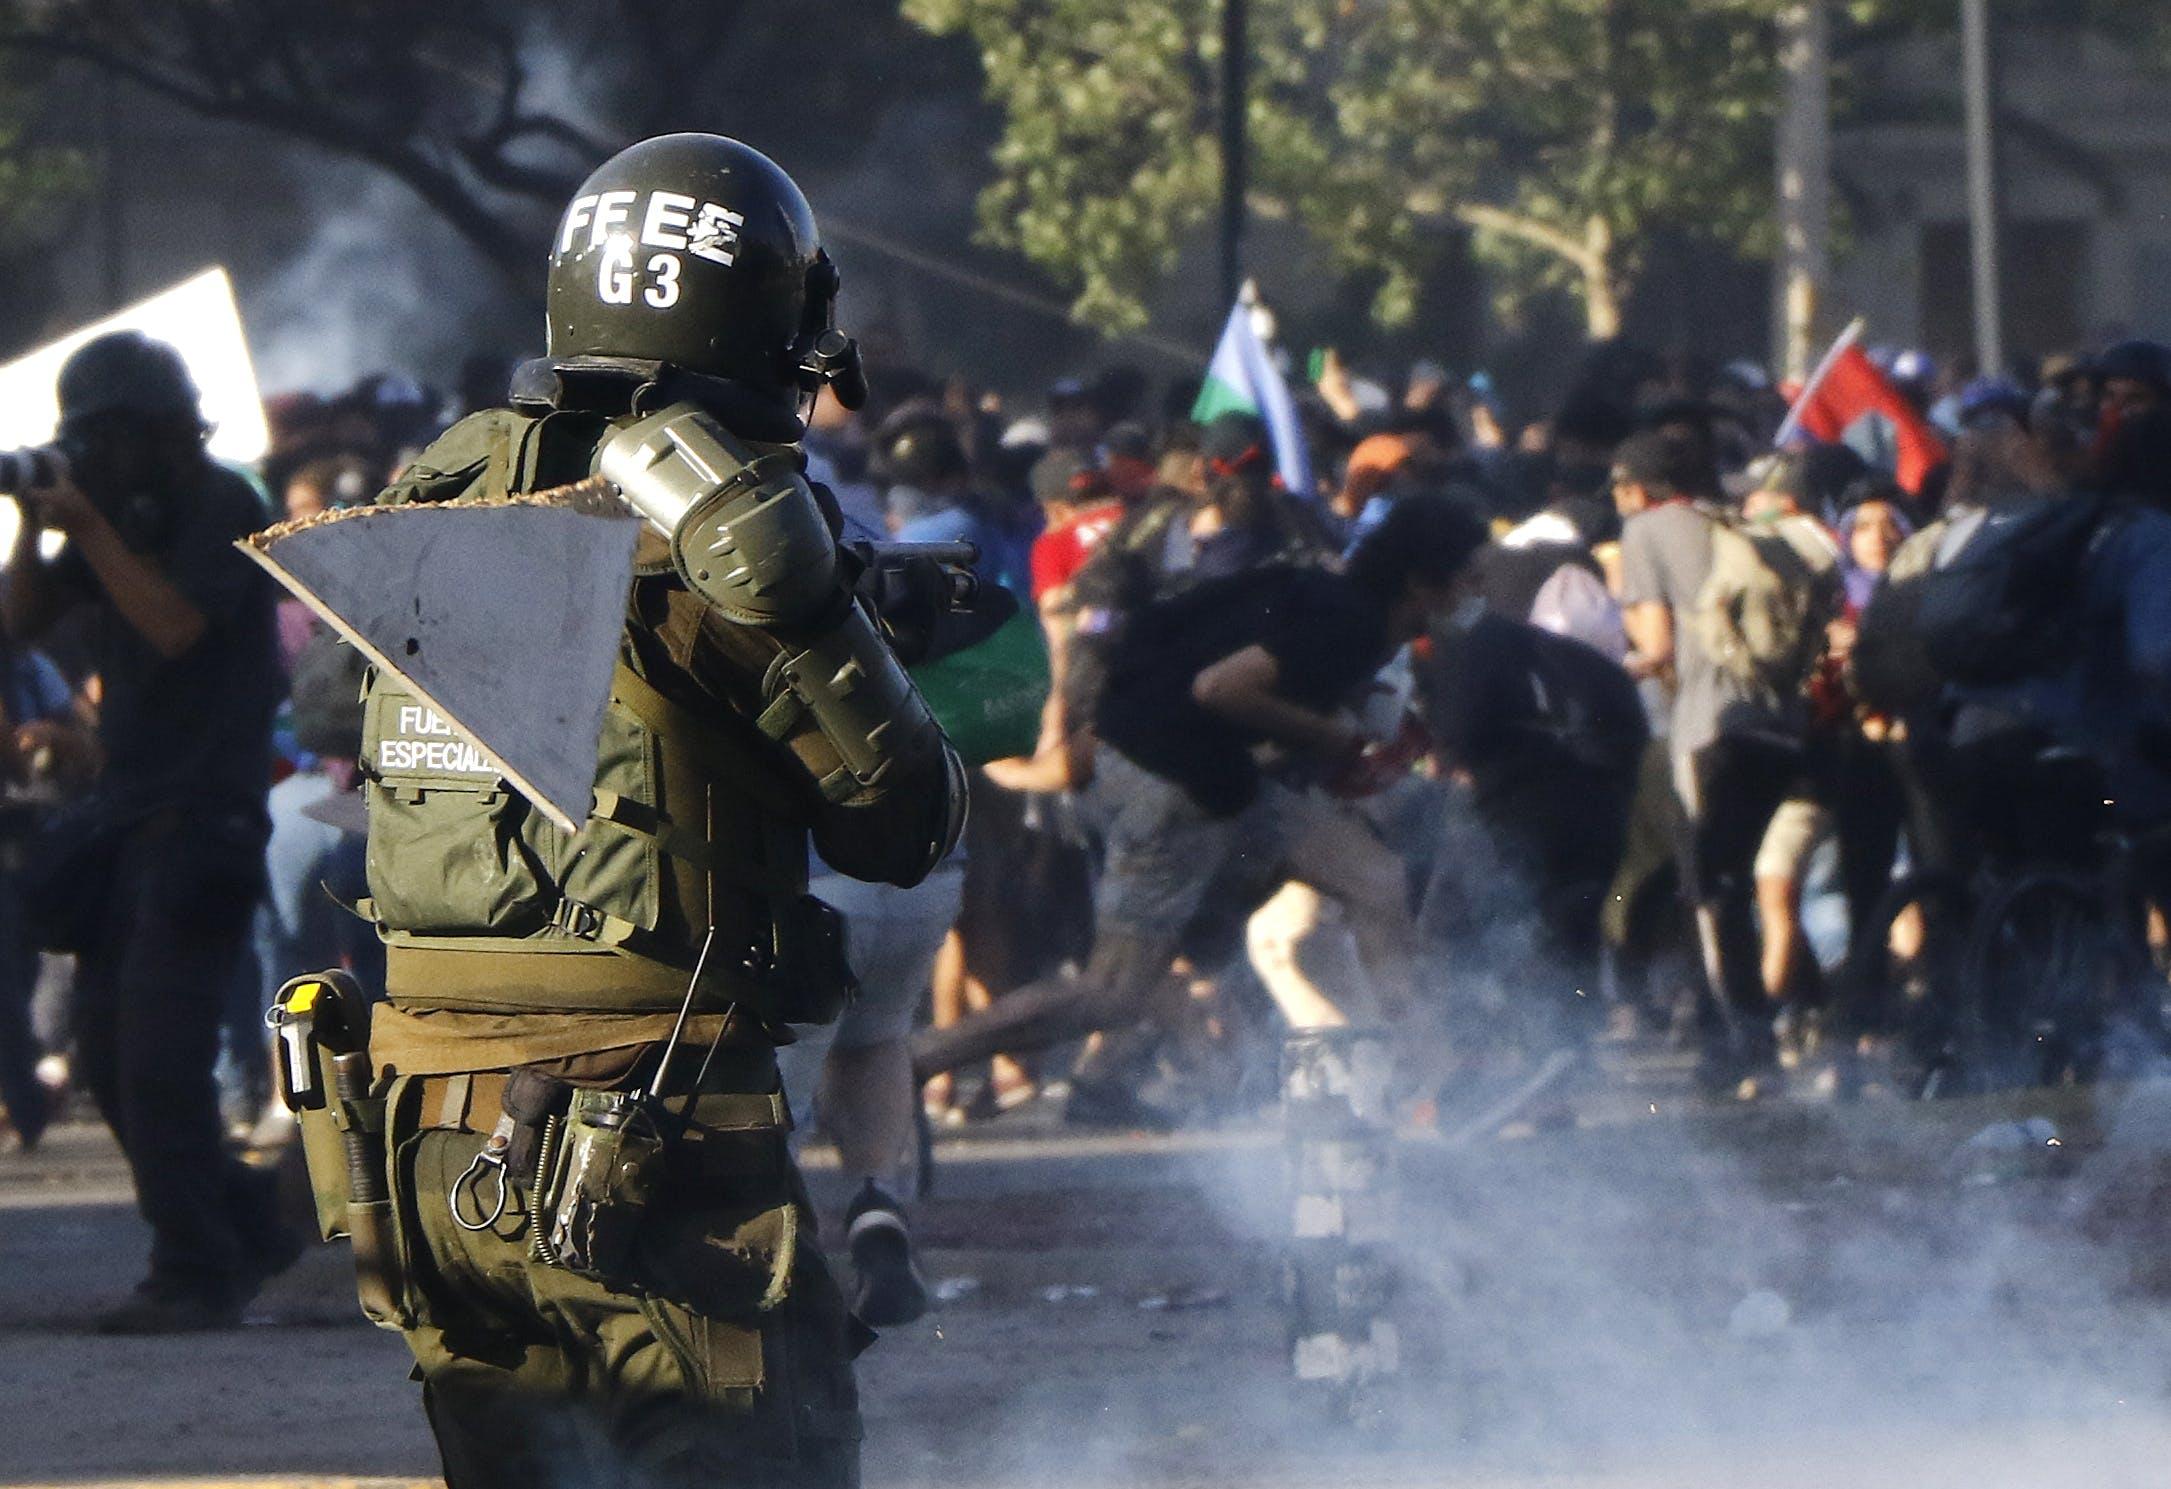 Sonoteca: Estado de Emergencia, Frases para la Historia - Especial Crisis Social - Emisor Podcasting